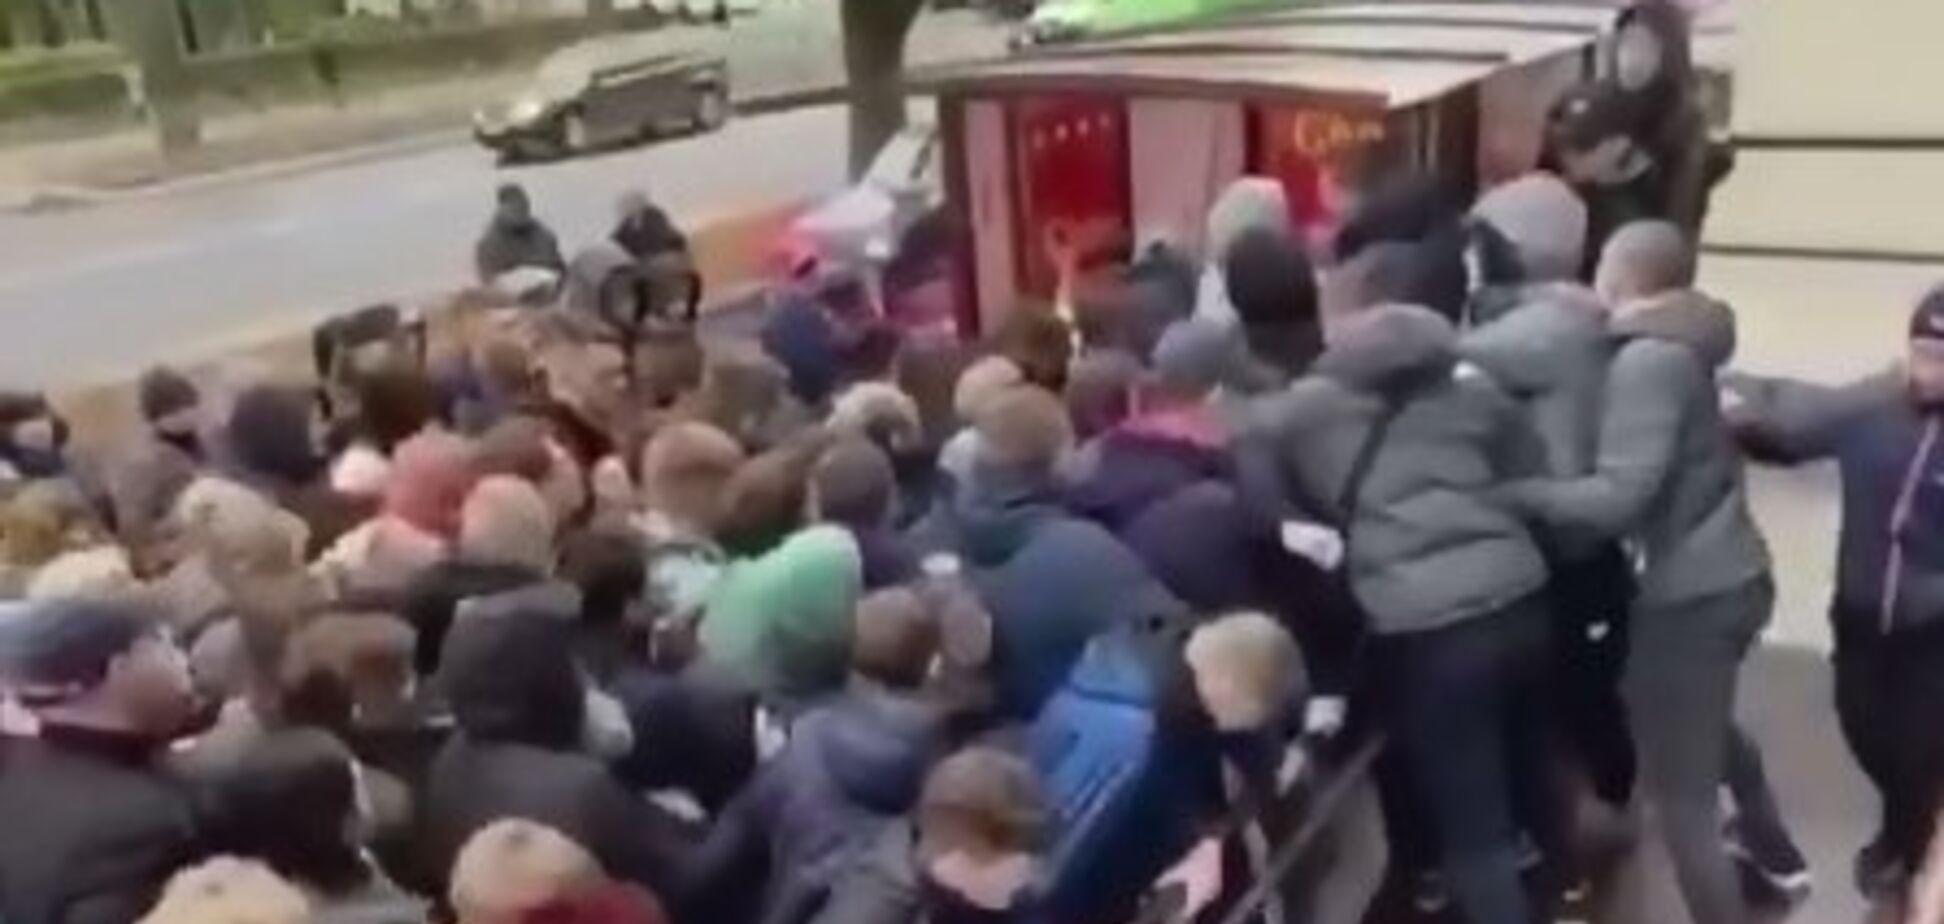 'Европа все ближе!' Украинцы штурмом взяли секонд-хенды. Видео